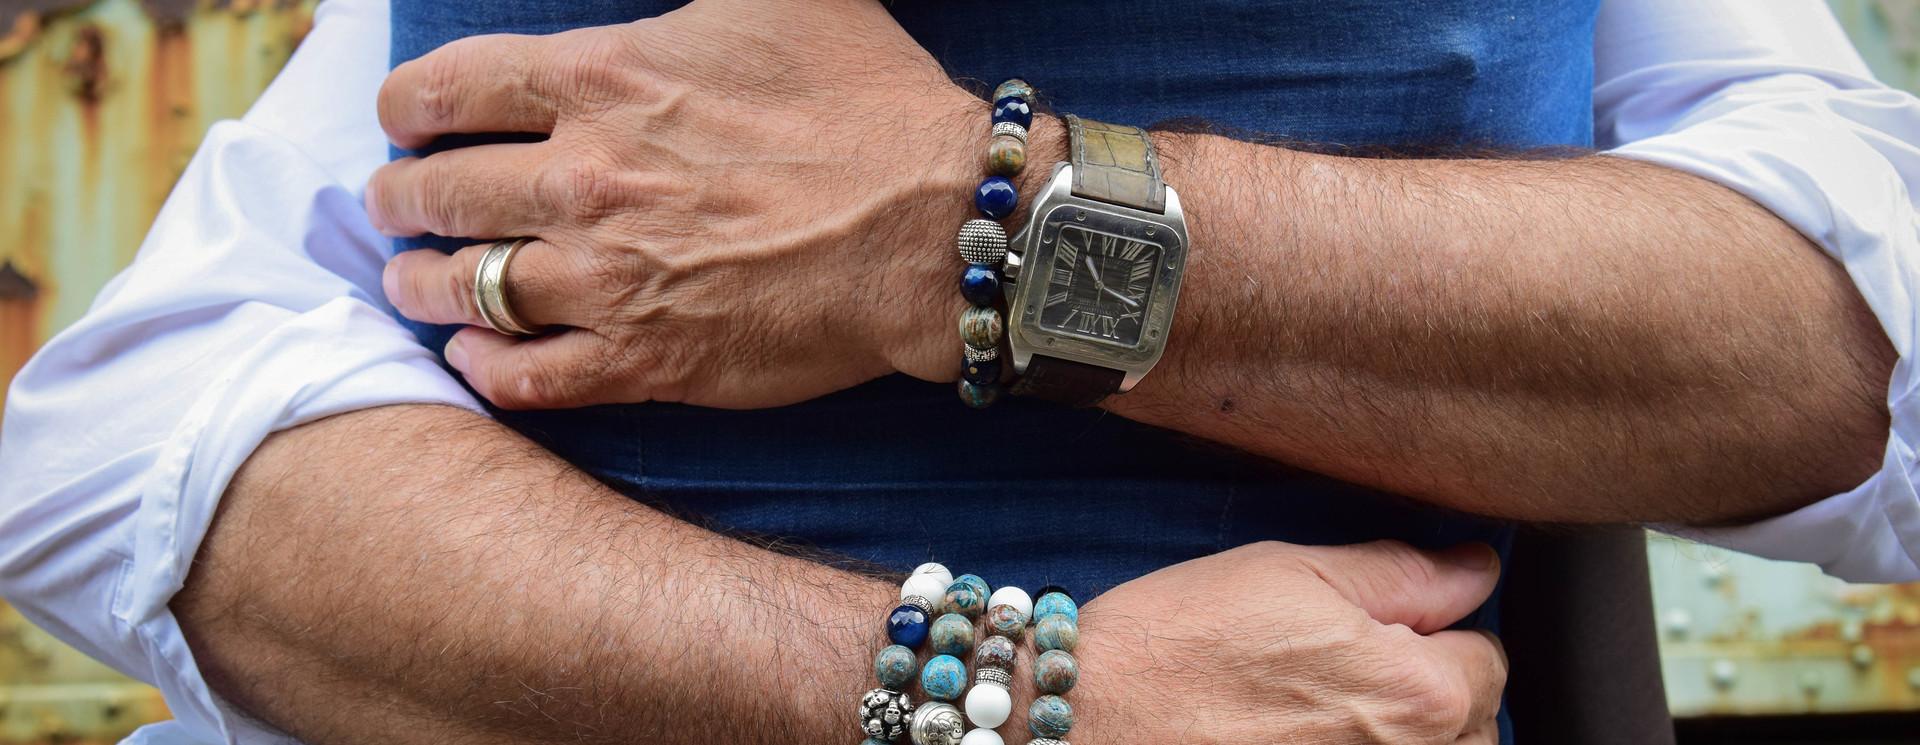 Unisex Gender bracelet